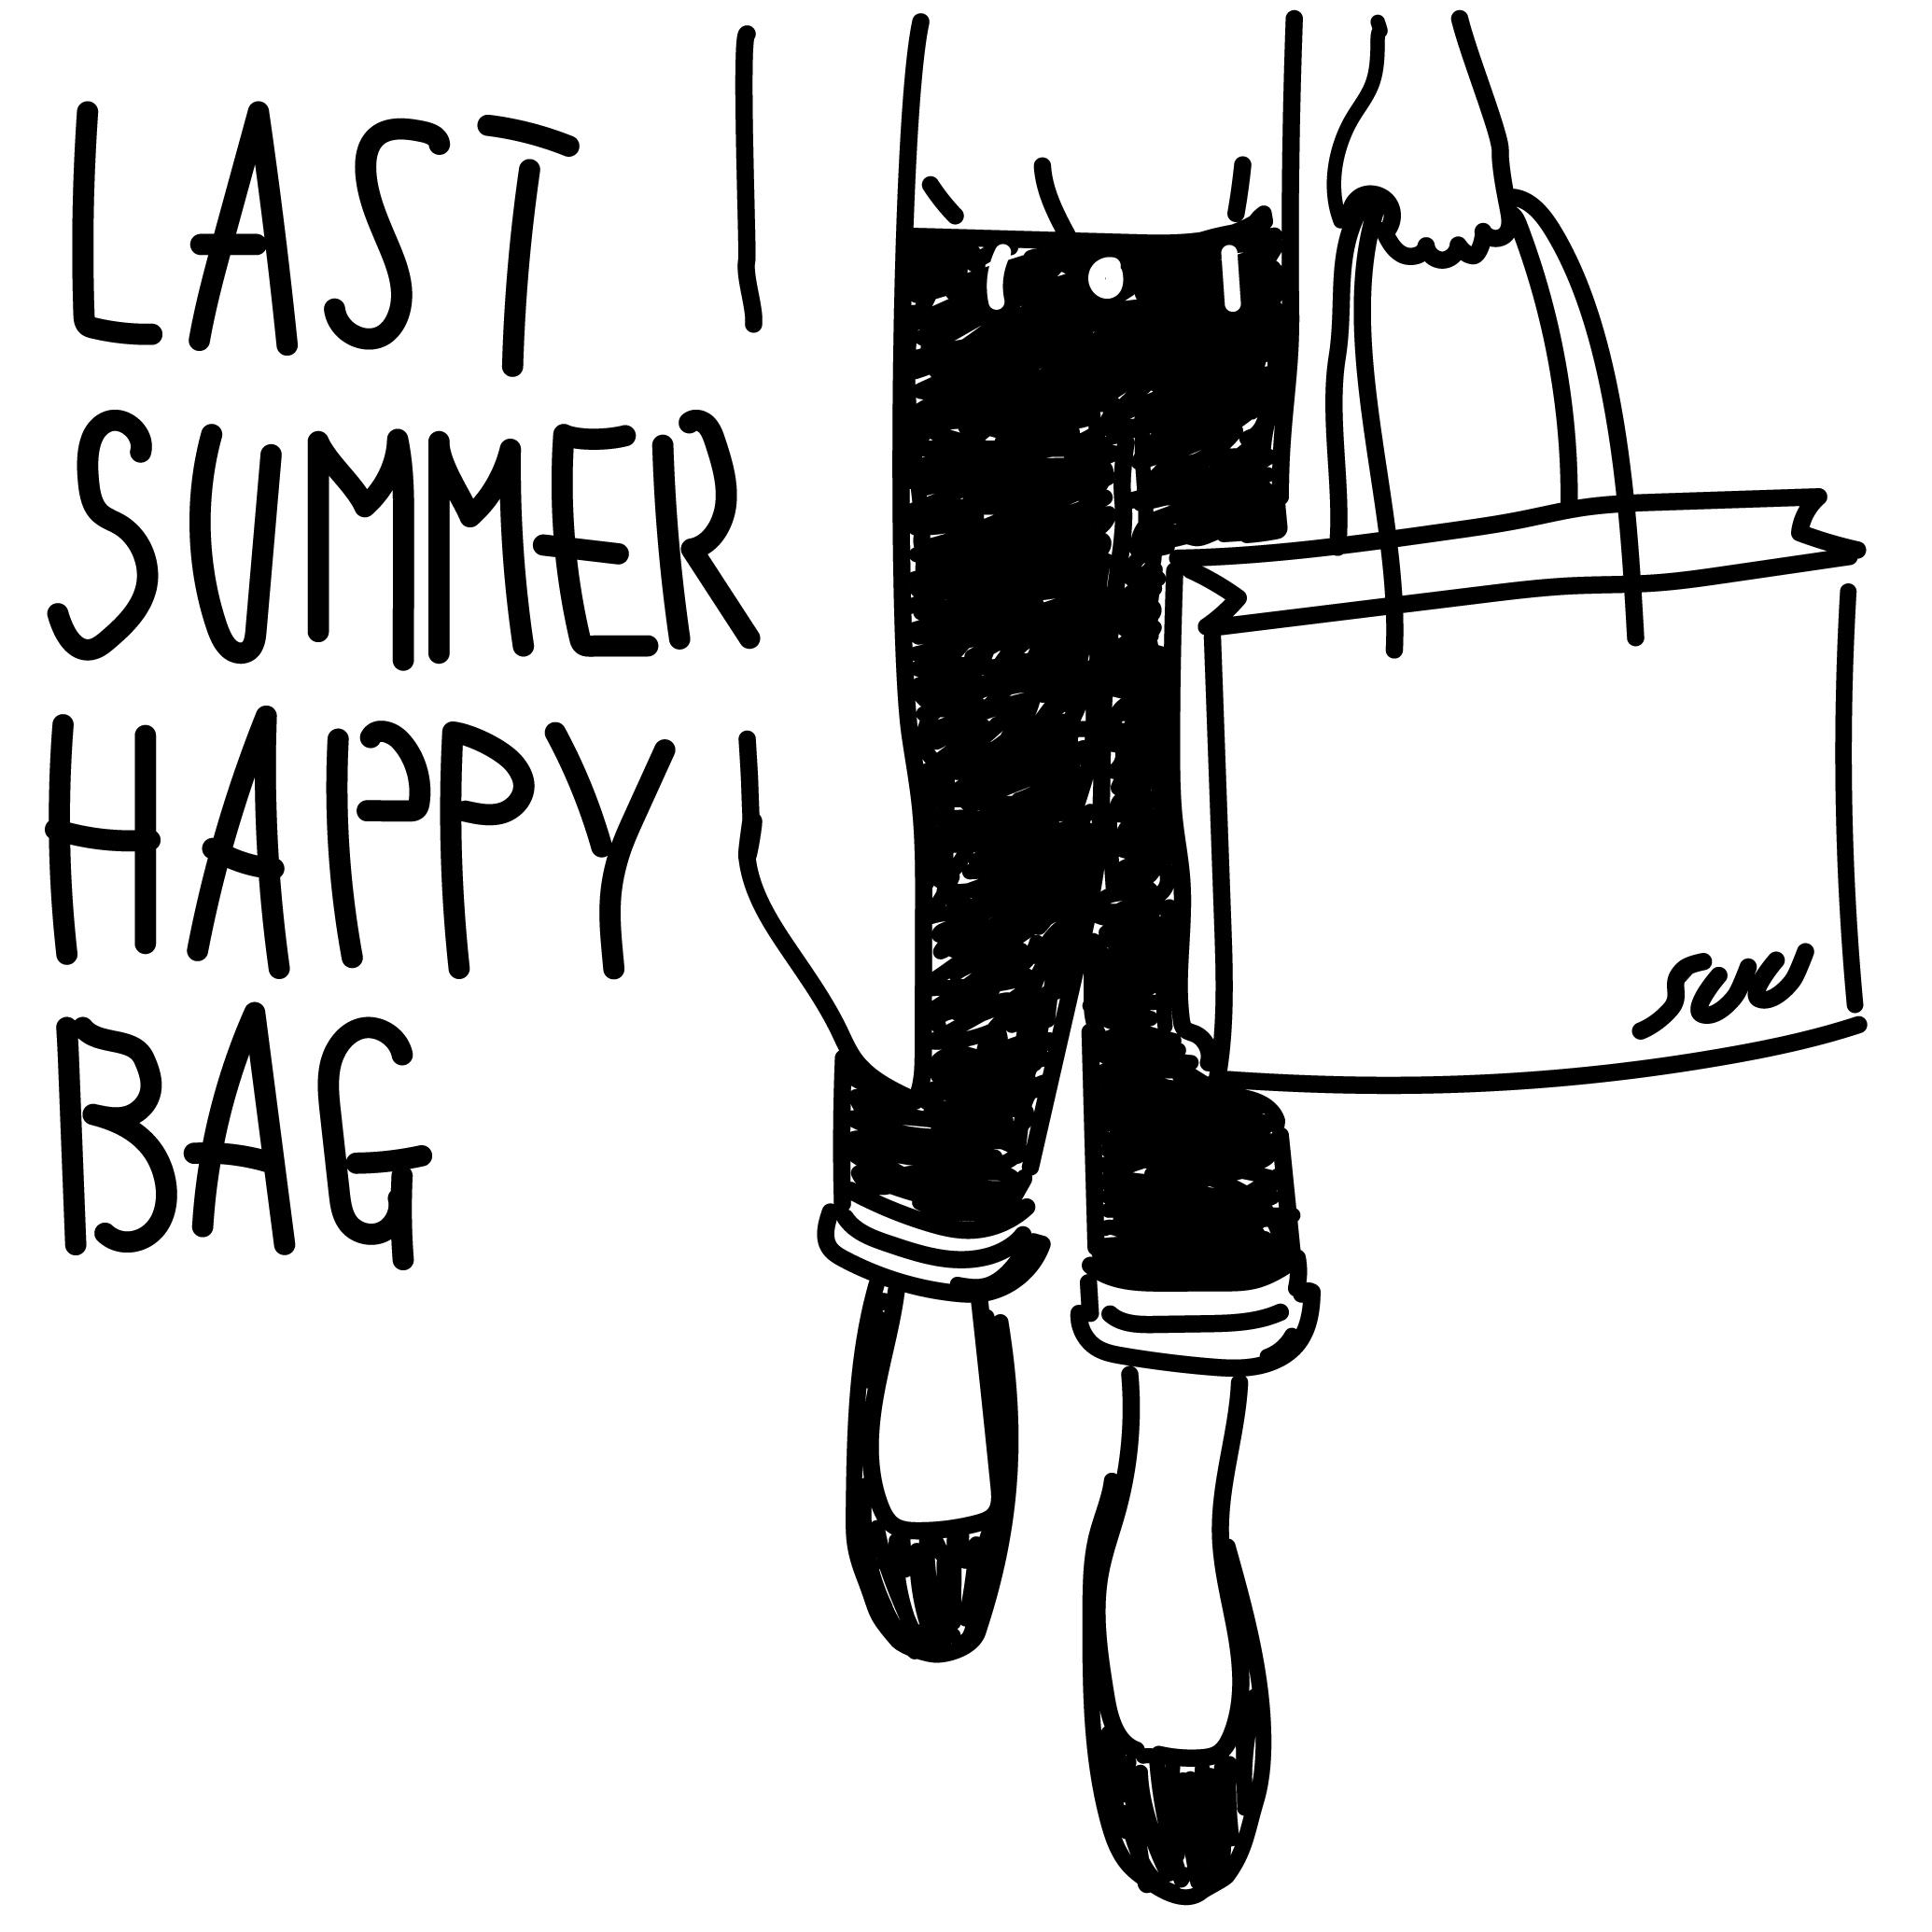 SUU 2021 LAST SUMMER HAPPY BAG : Bセット